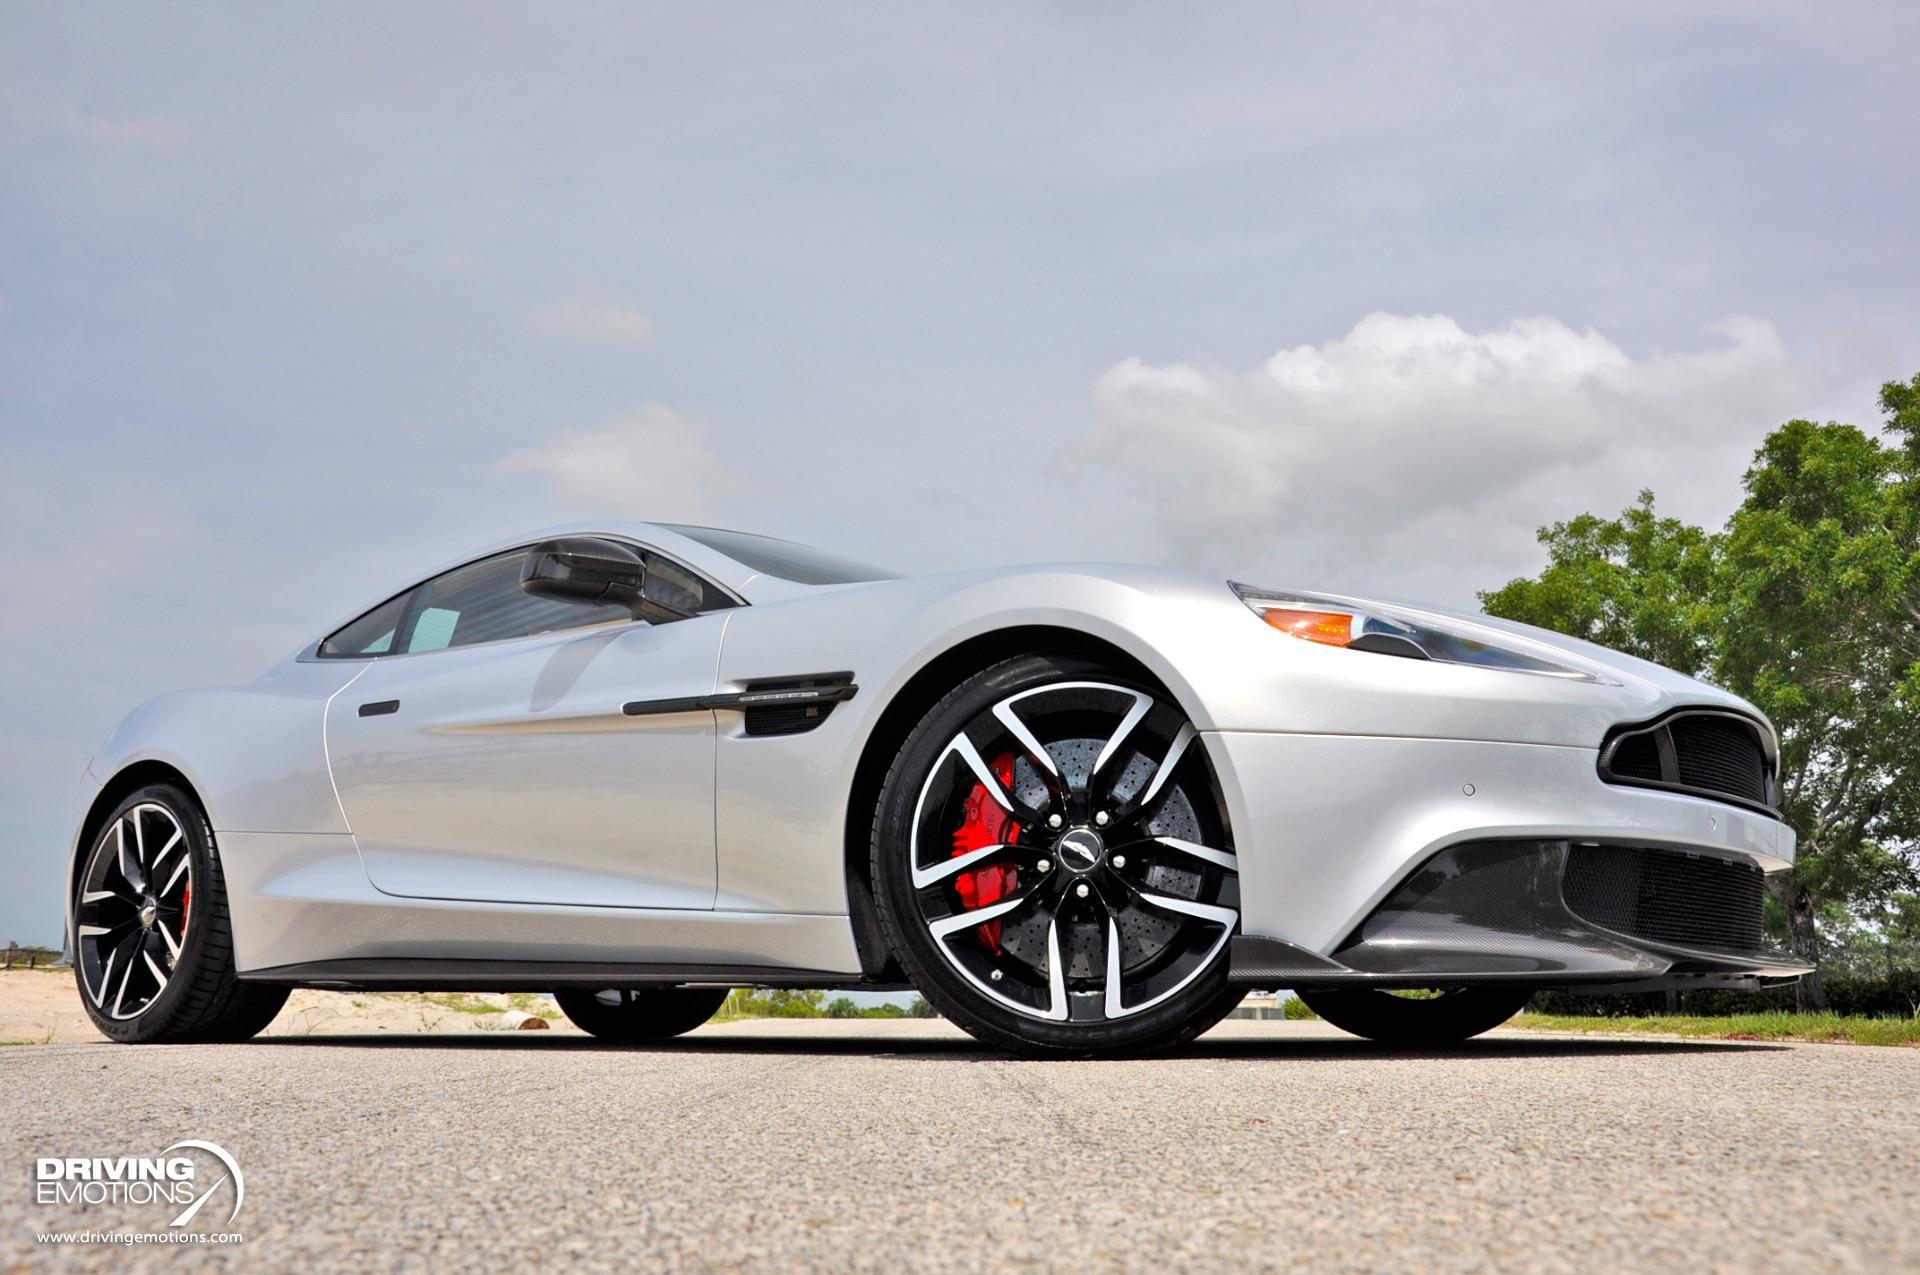 Used 2018 Aston Martin Vanquish S S $337K MSRP!! | Lake Park, FL